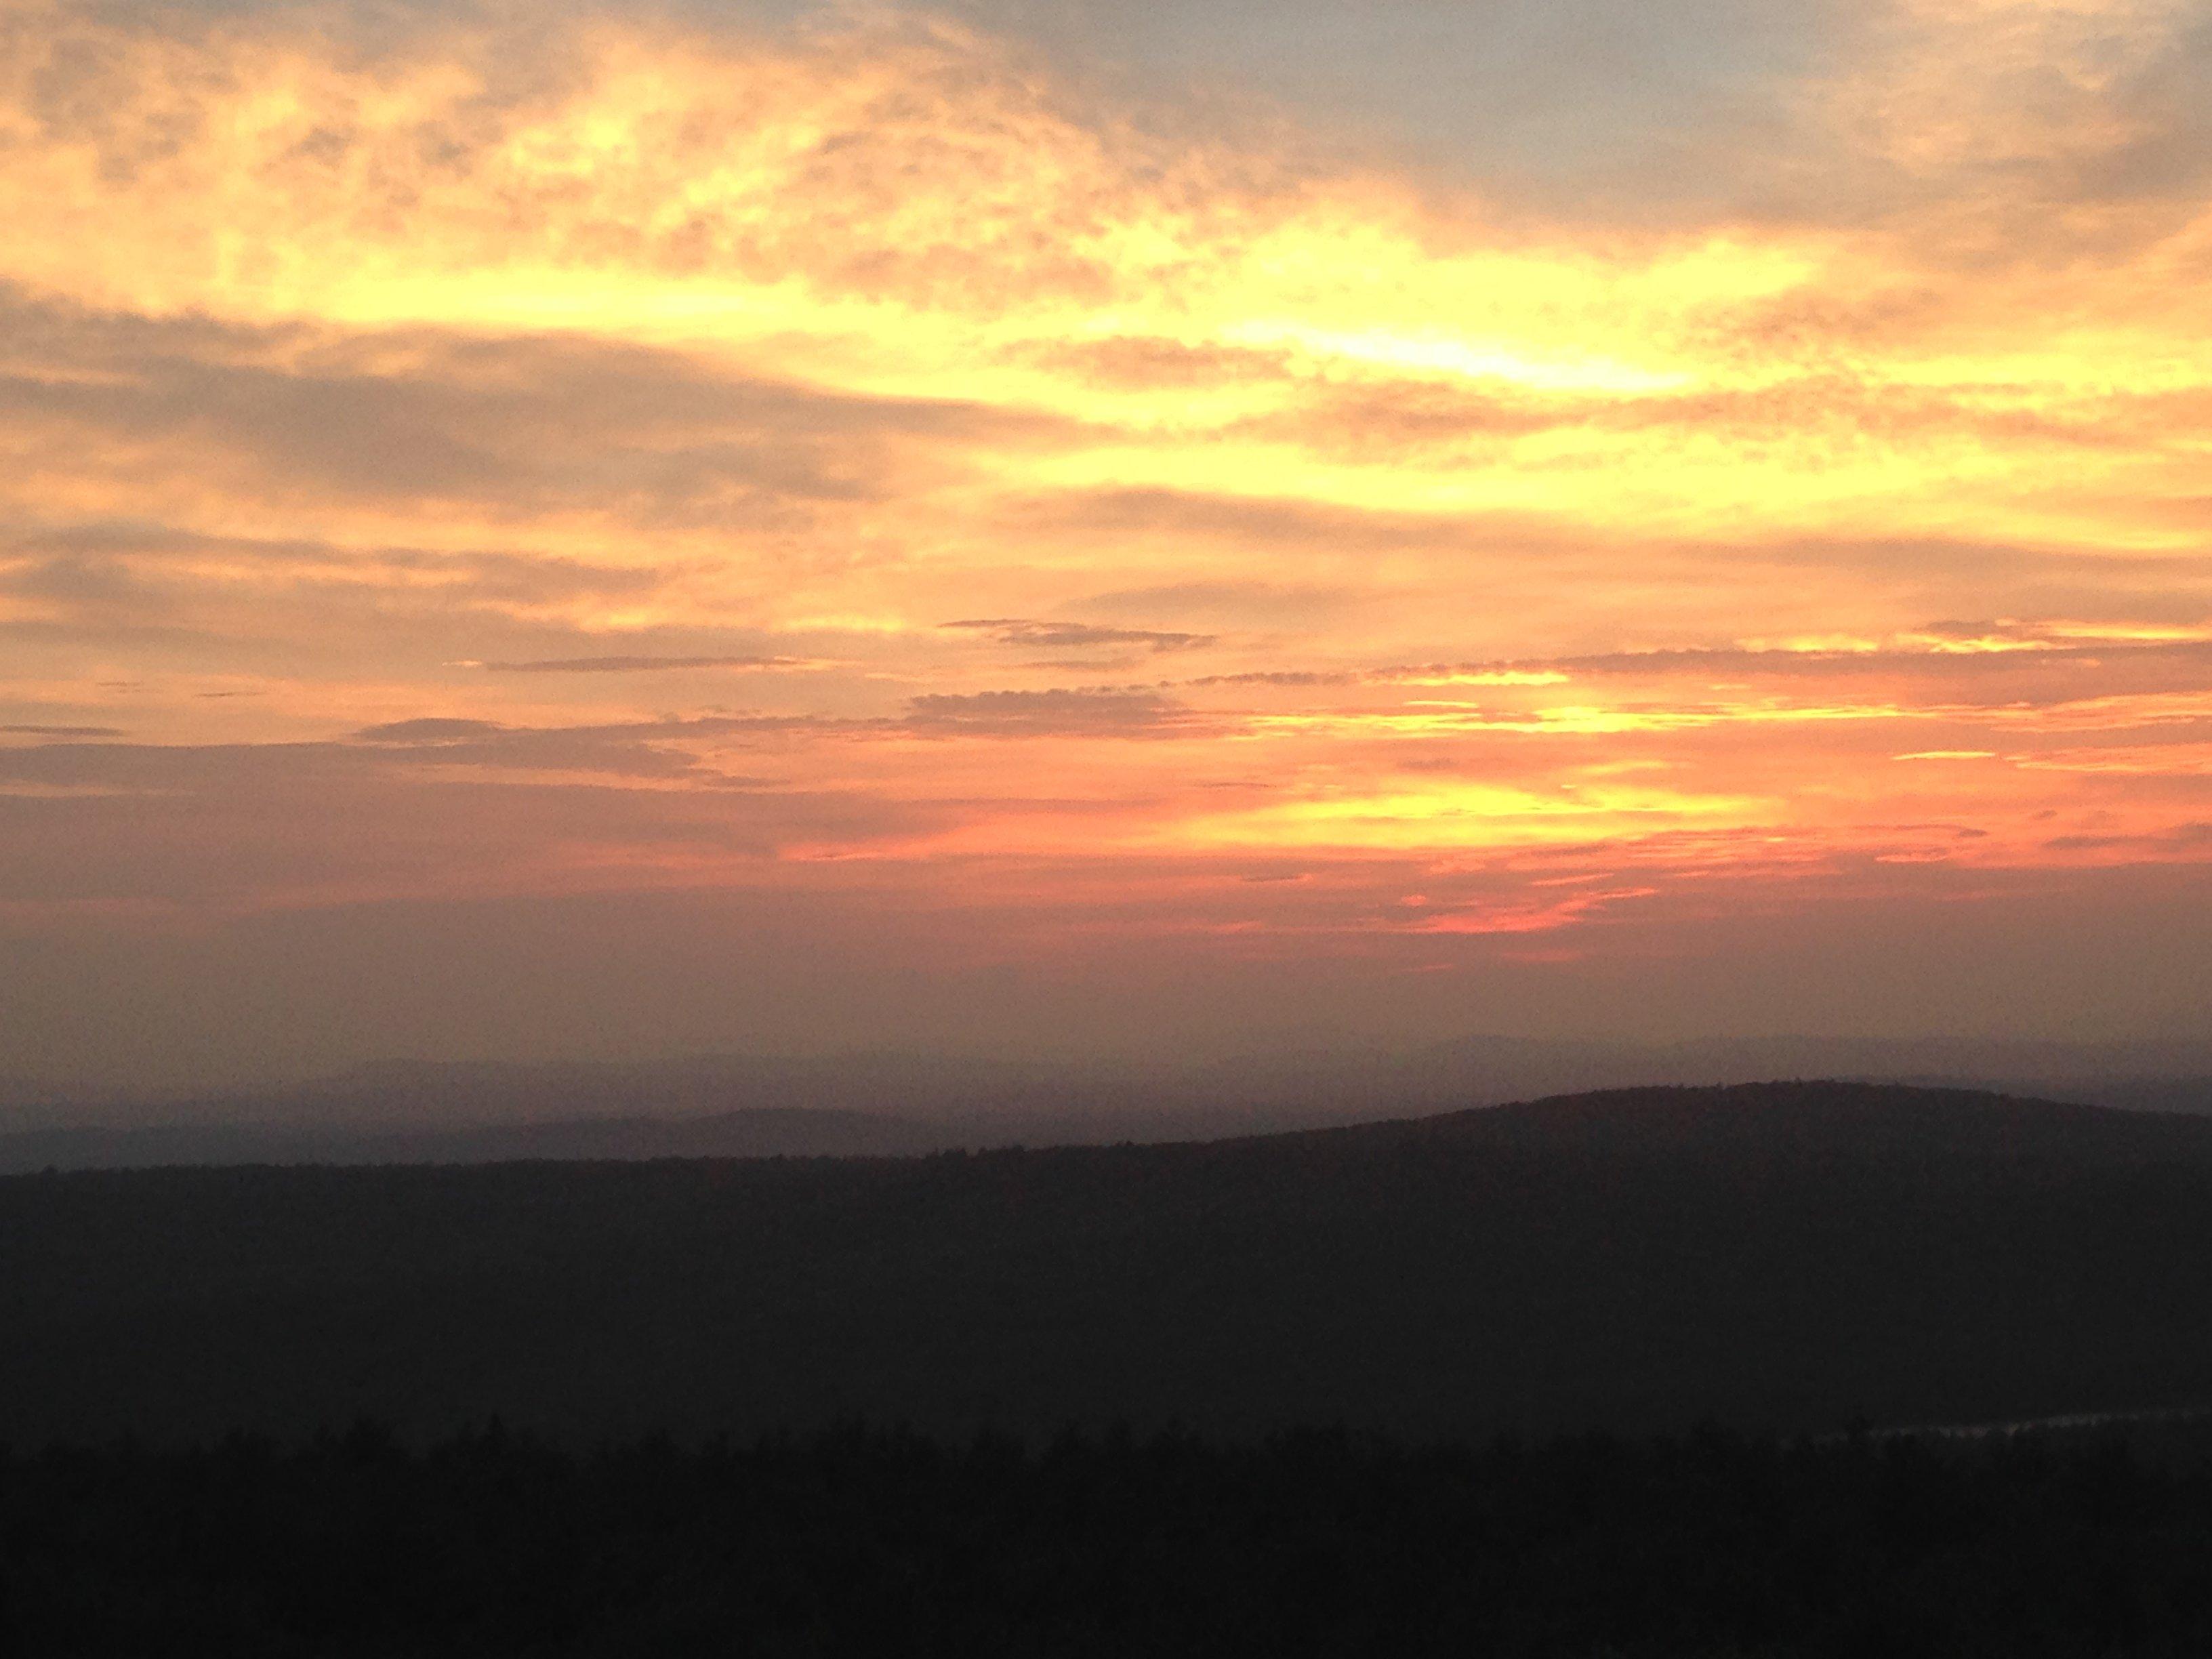 Sunset from Mt. Pisgah firetower